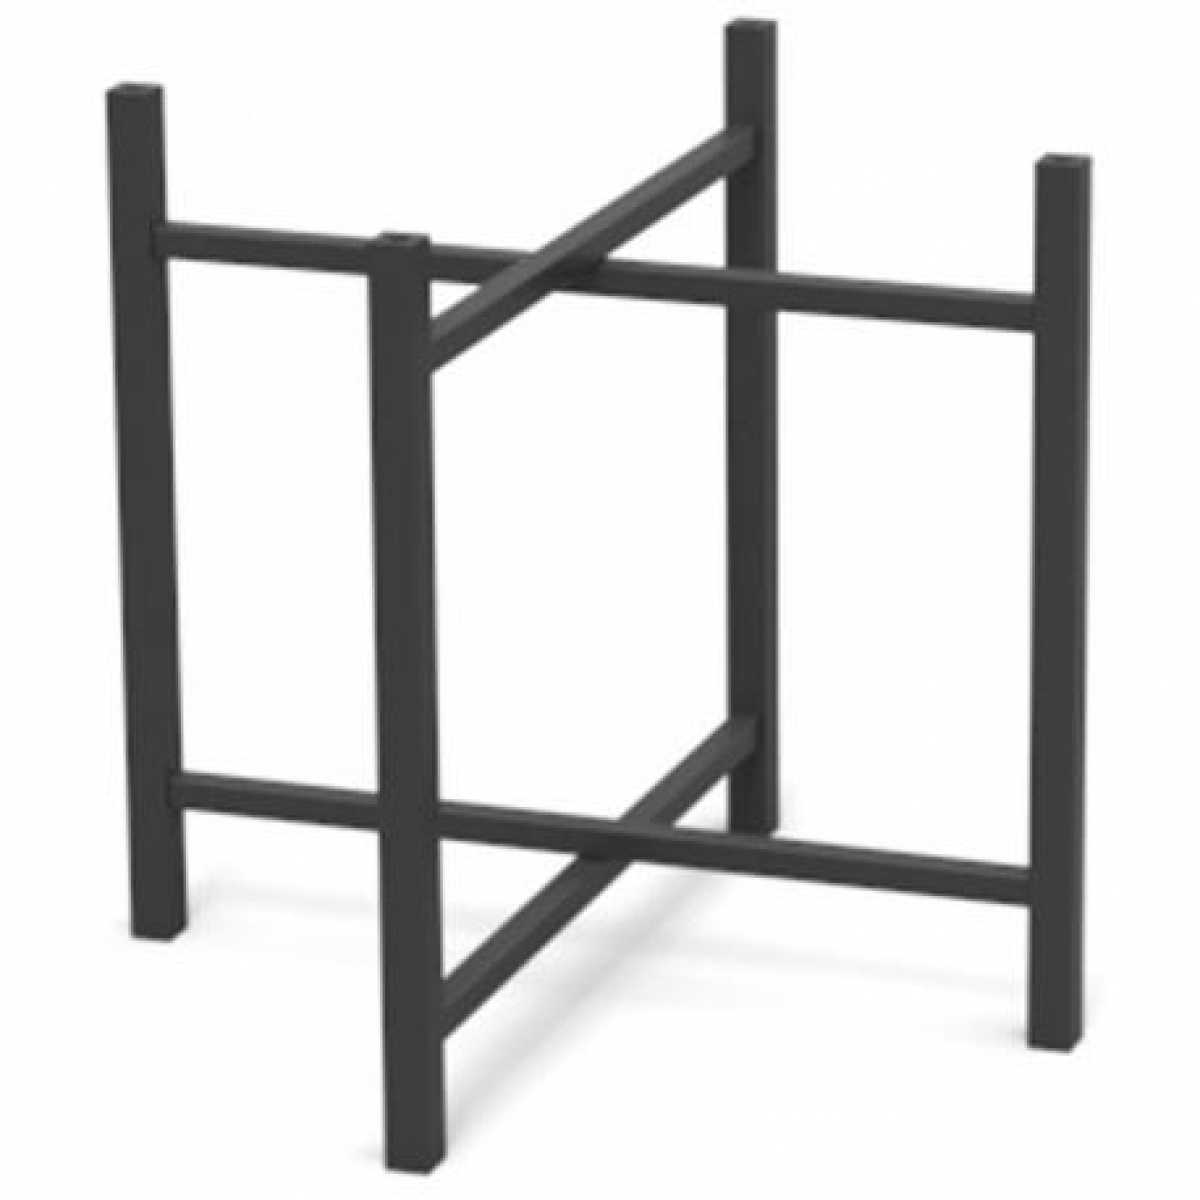 CRASTER 700 Serisi Siyah Ayak, Kısa